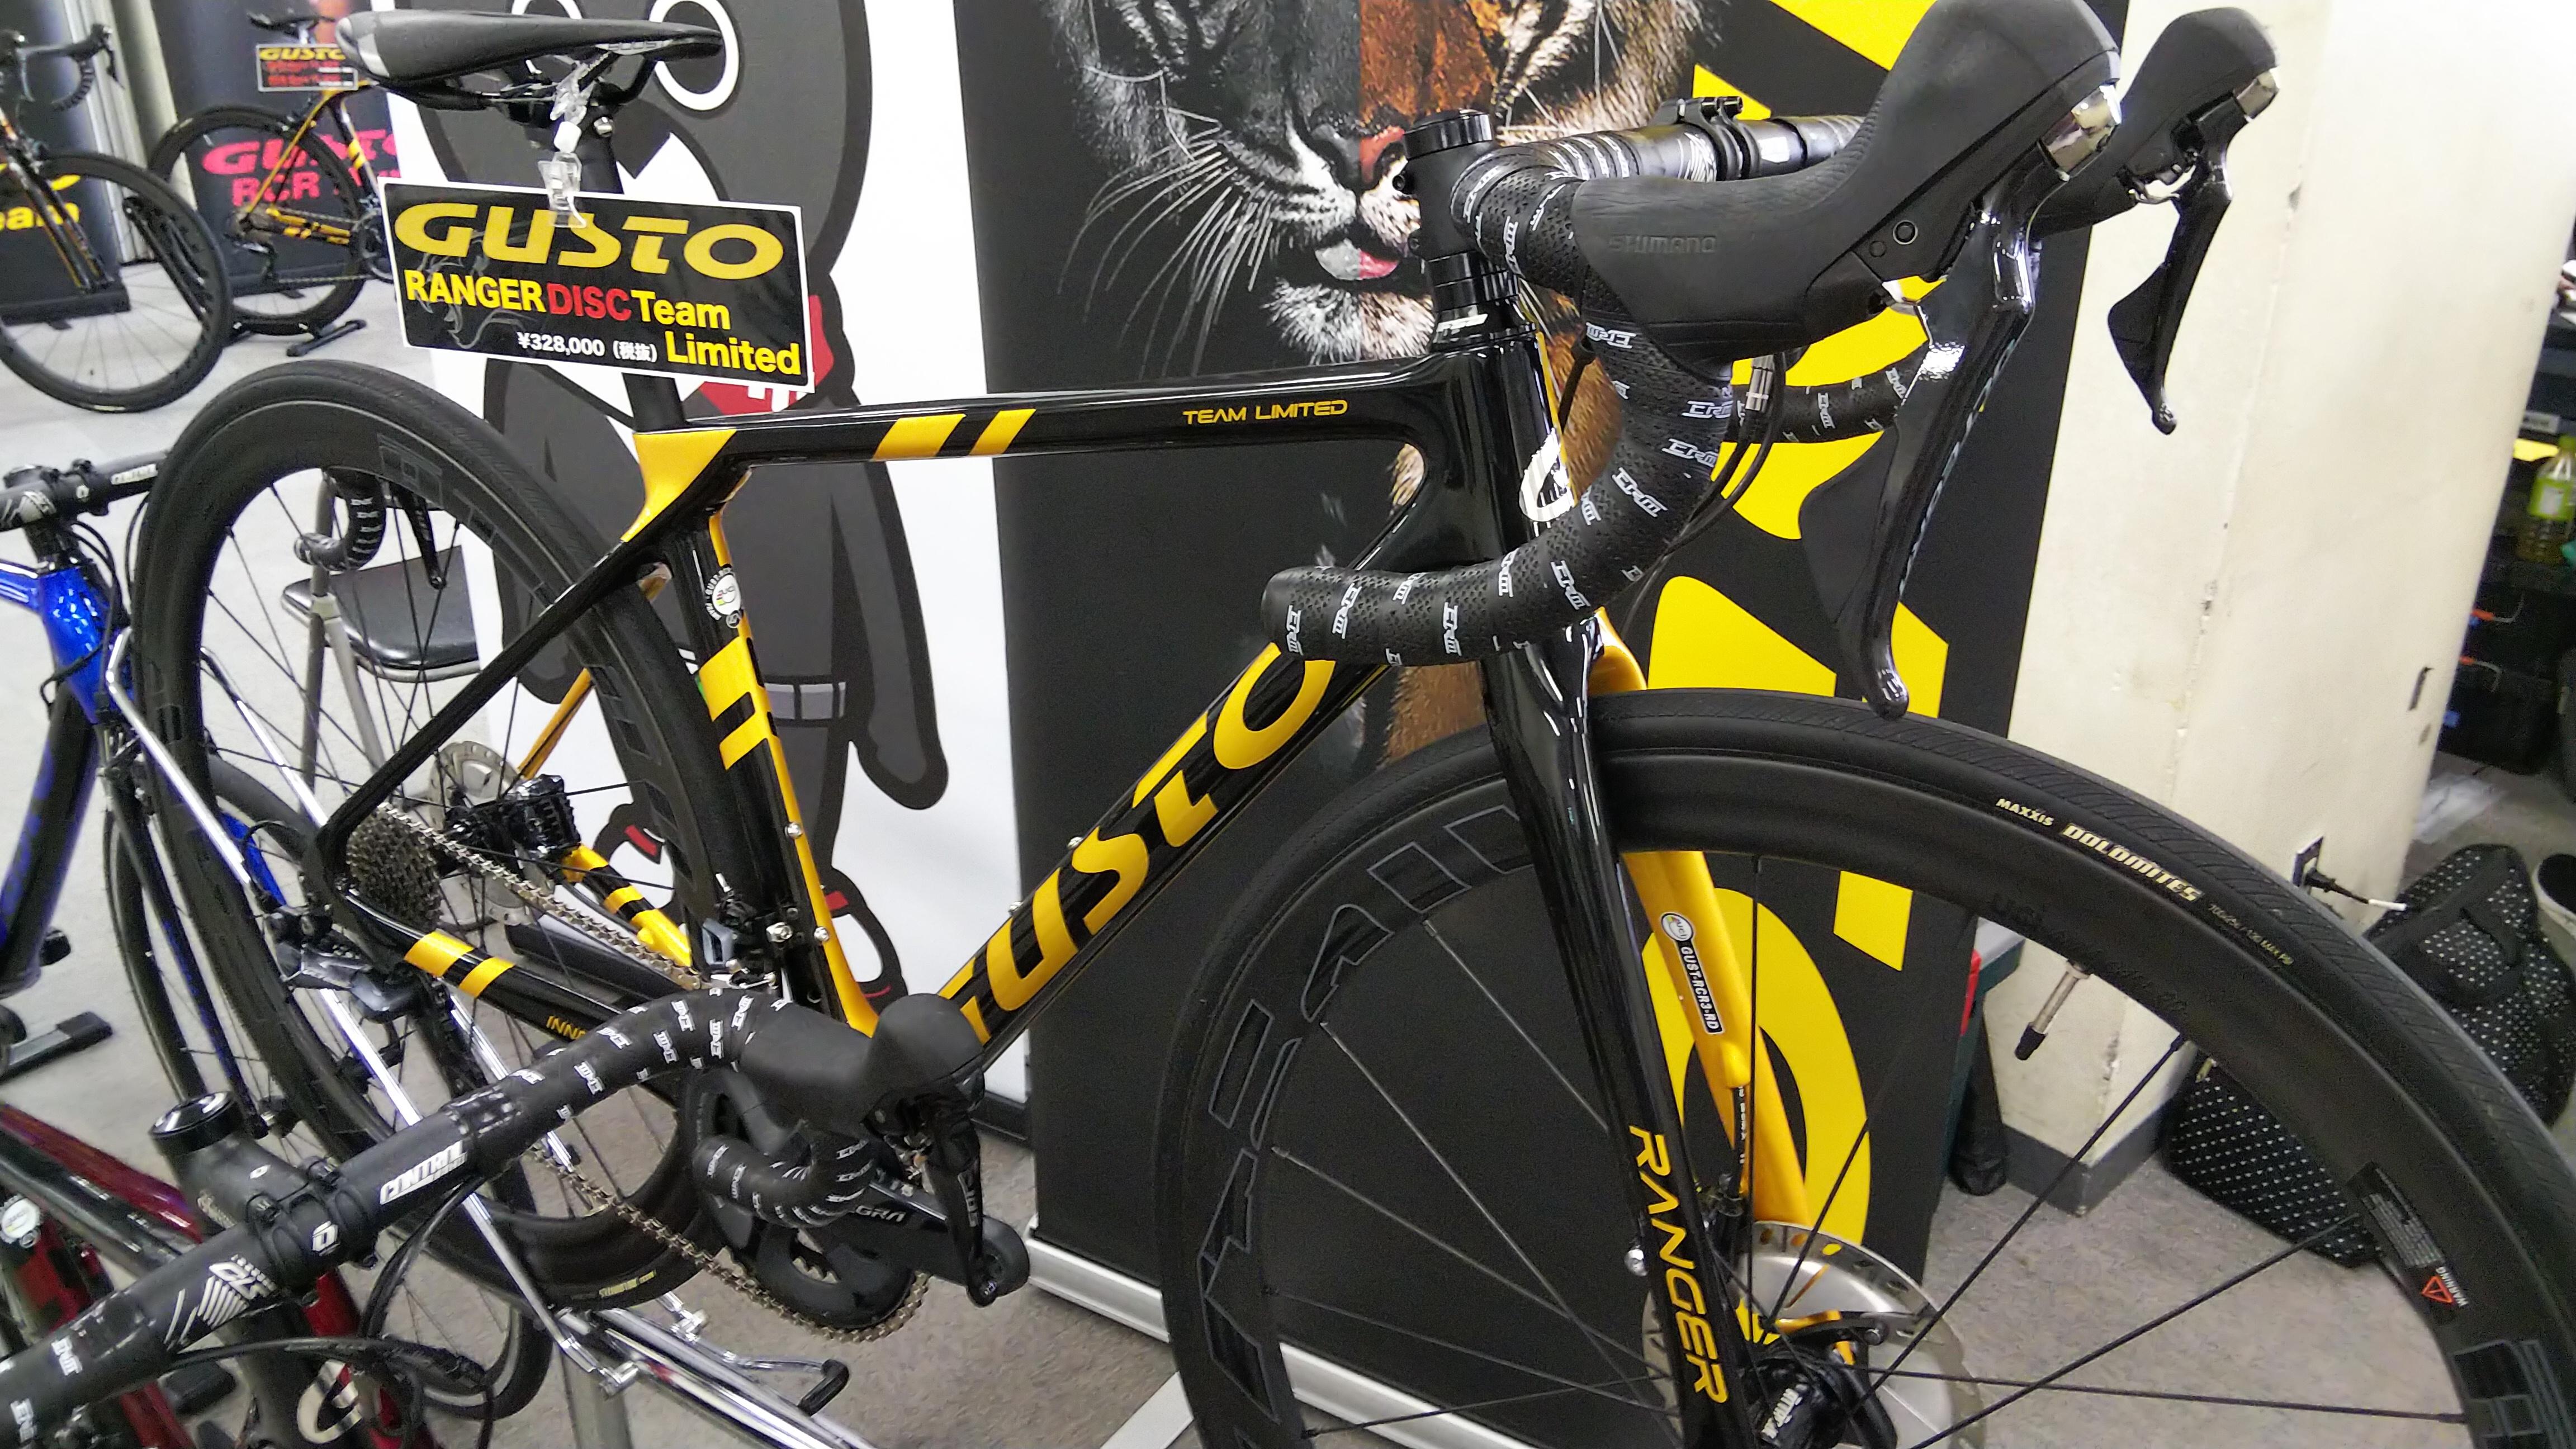 http://www.cyclomotohara.com/information/images/DSC_1273.JPG